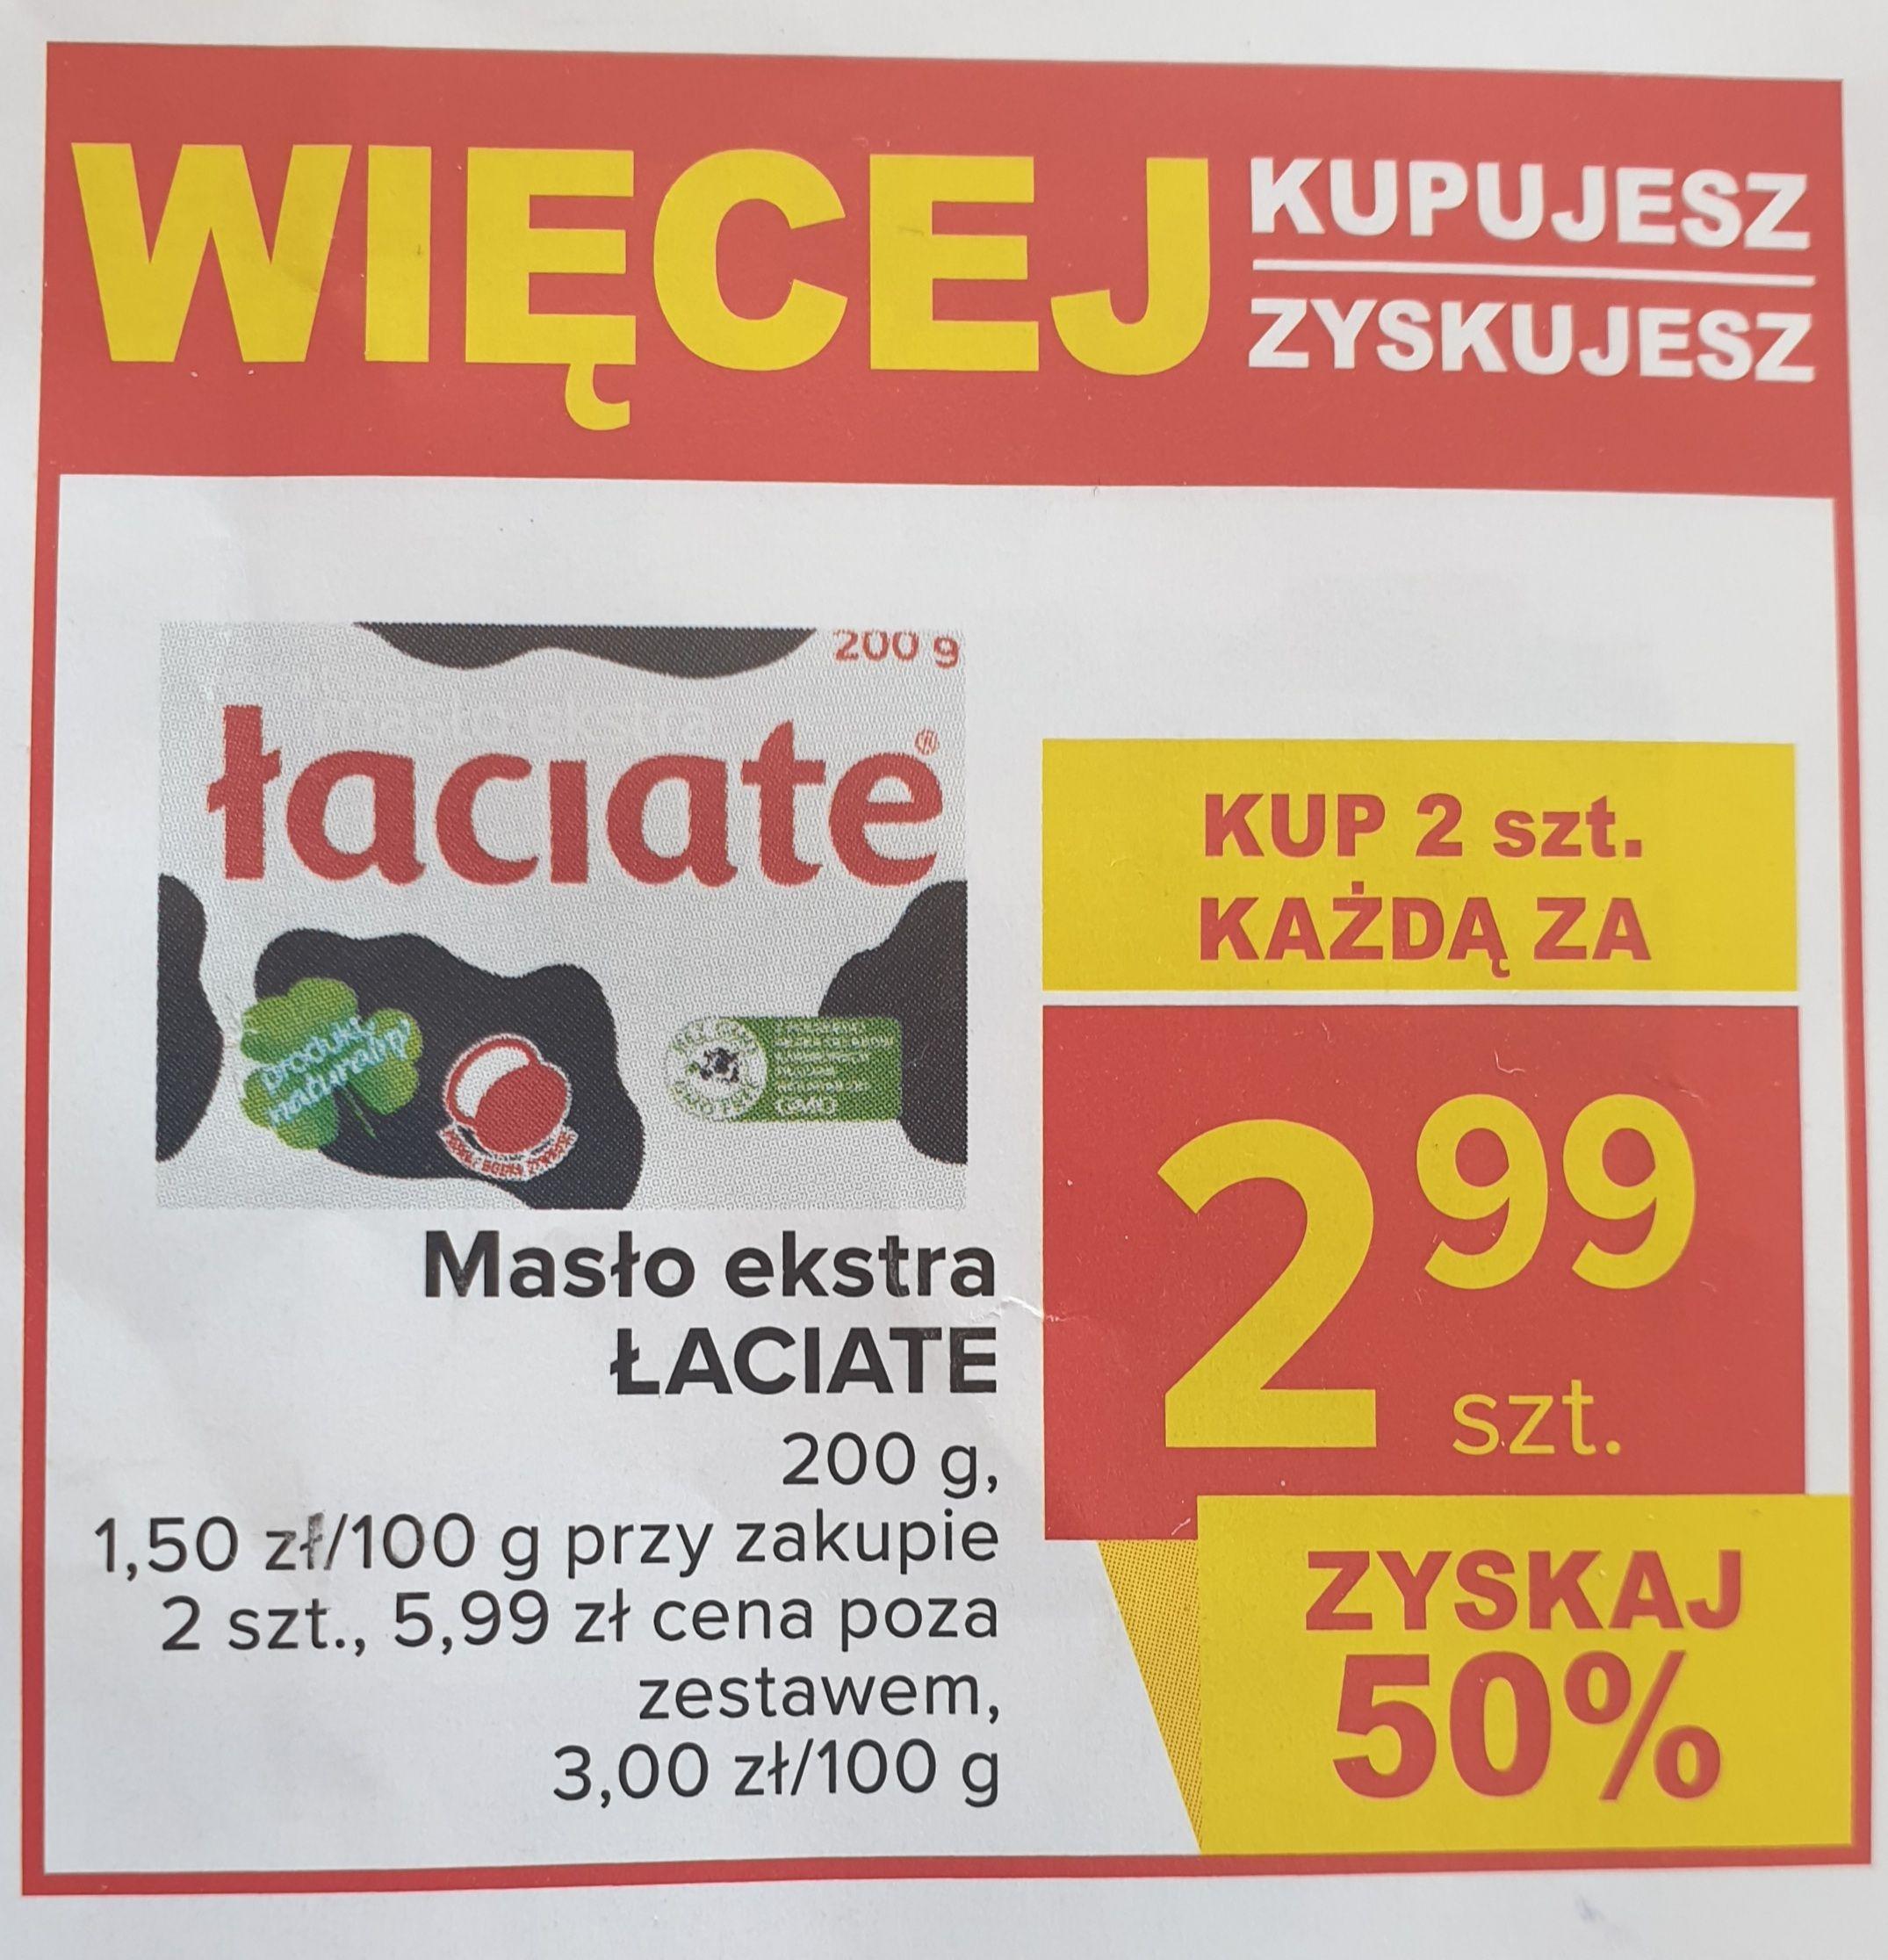 Masło łaciate - Supeco